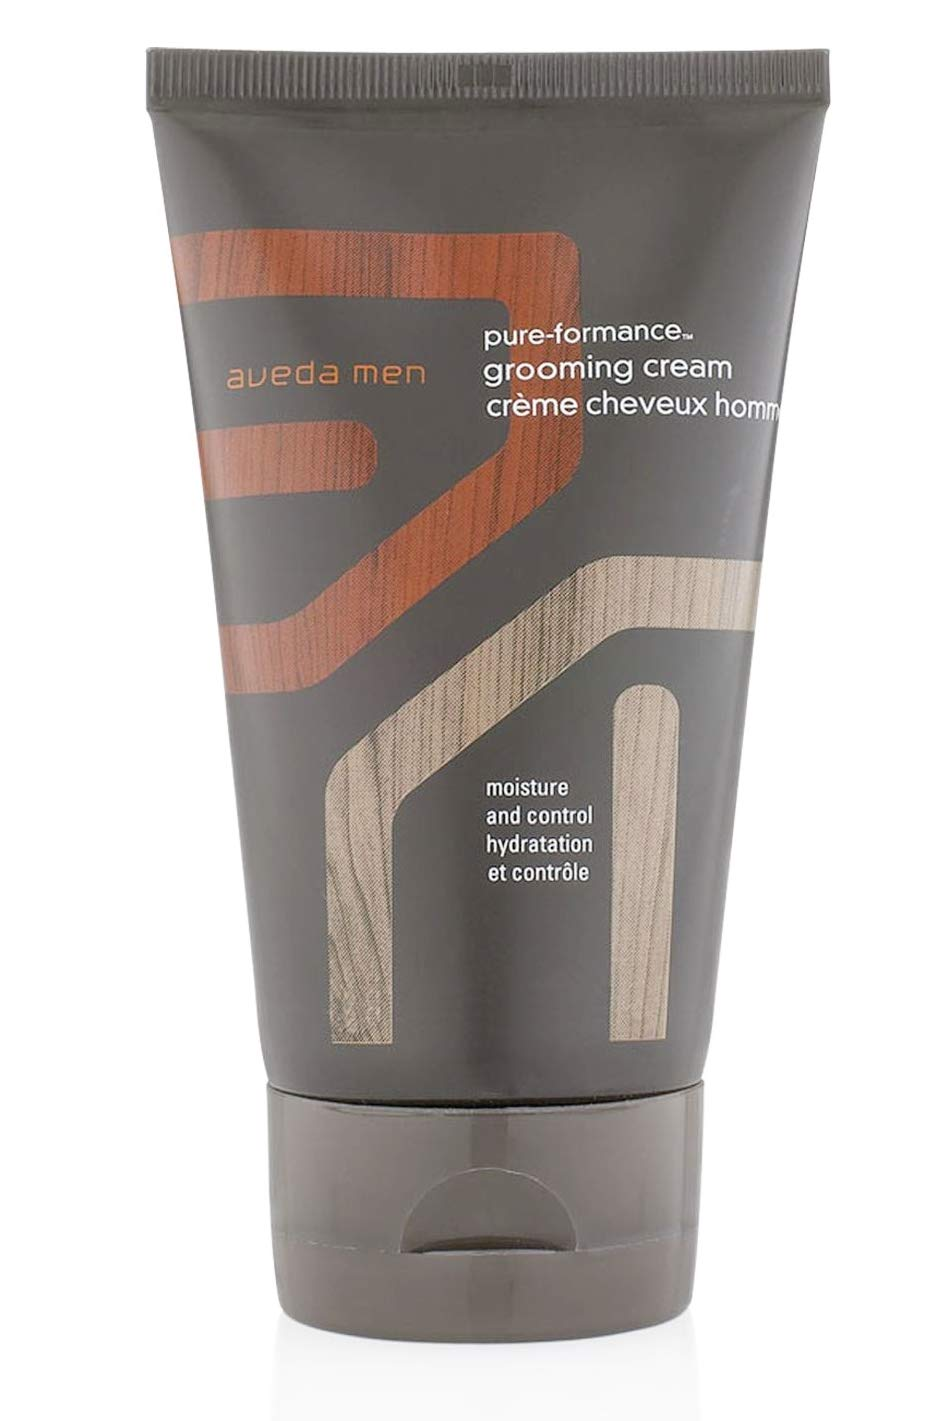 [Aveda] Men Pure Formance Grooming Cream, 4.2OZ Bundle with Oil Blotting Paper by Koco4u